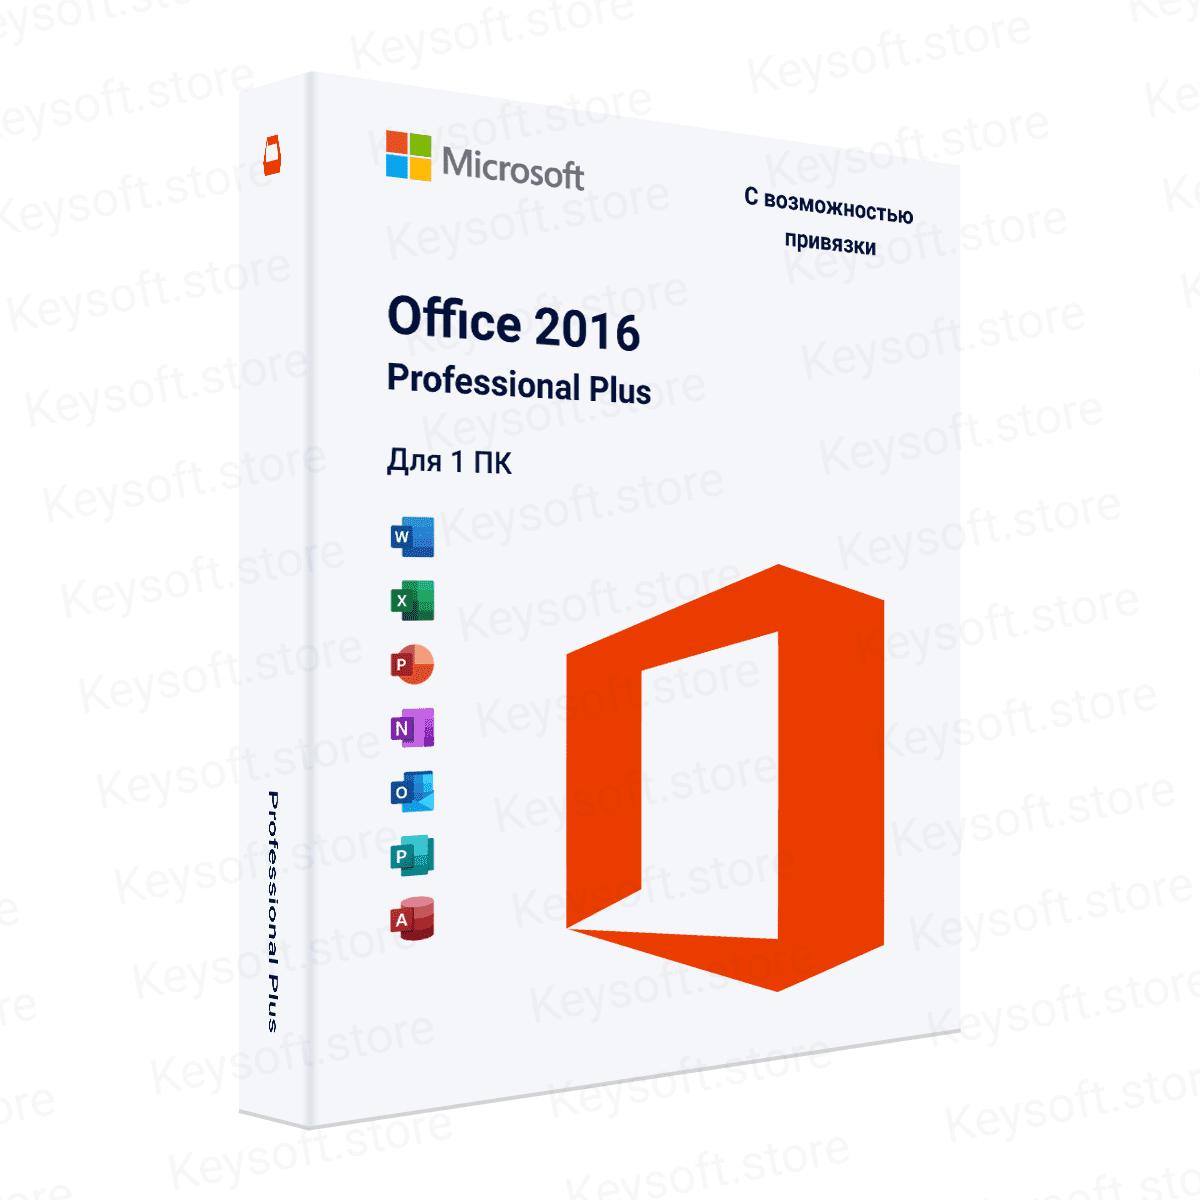 Office 2016 Professional Plus (С возможностью привязки)